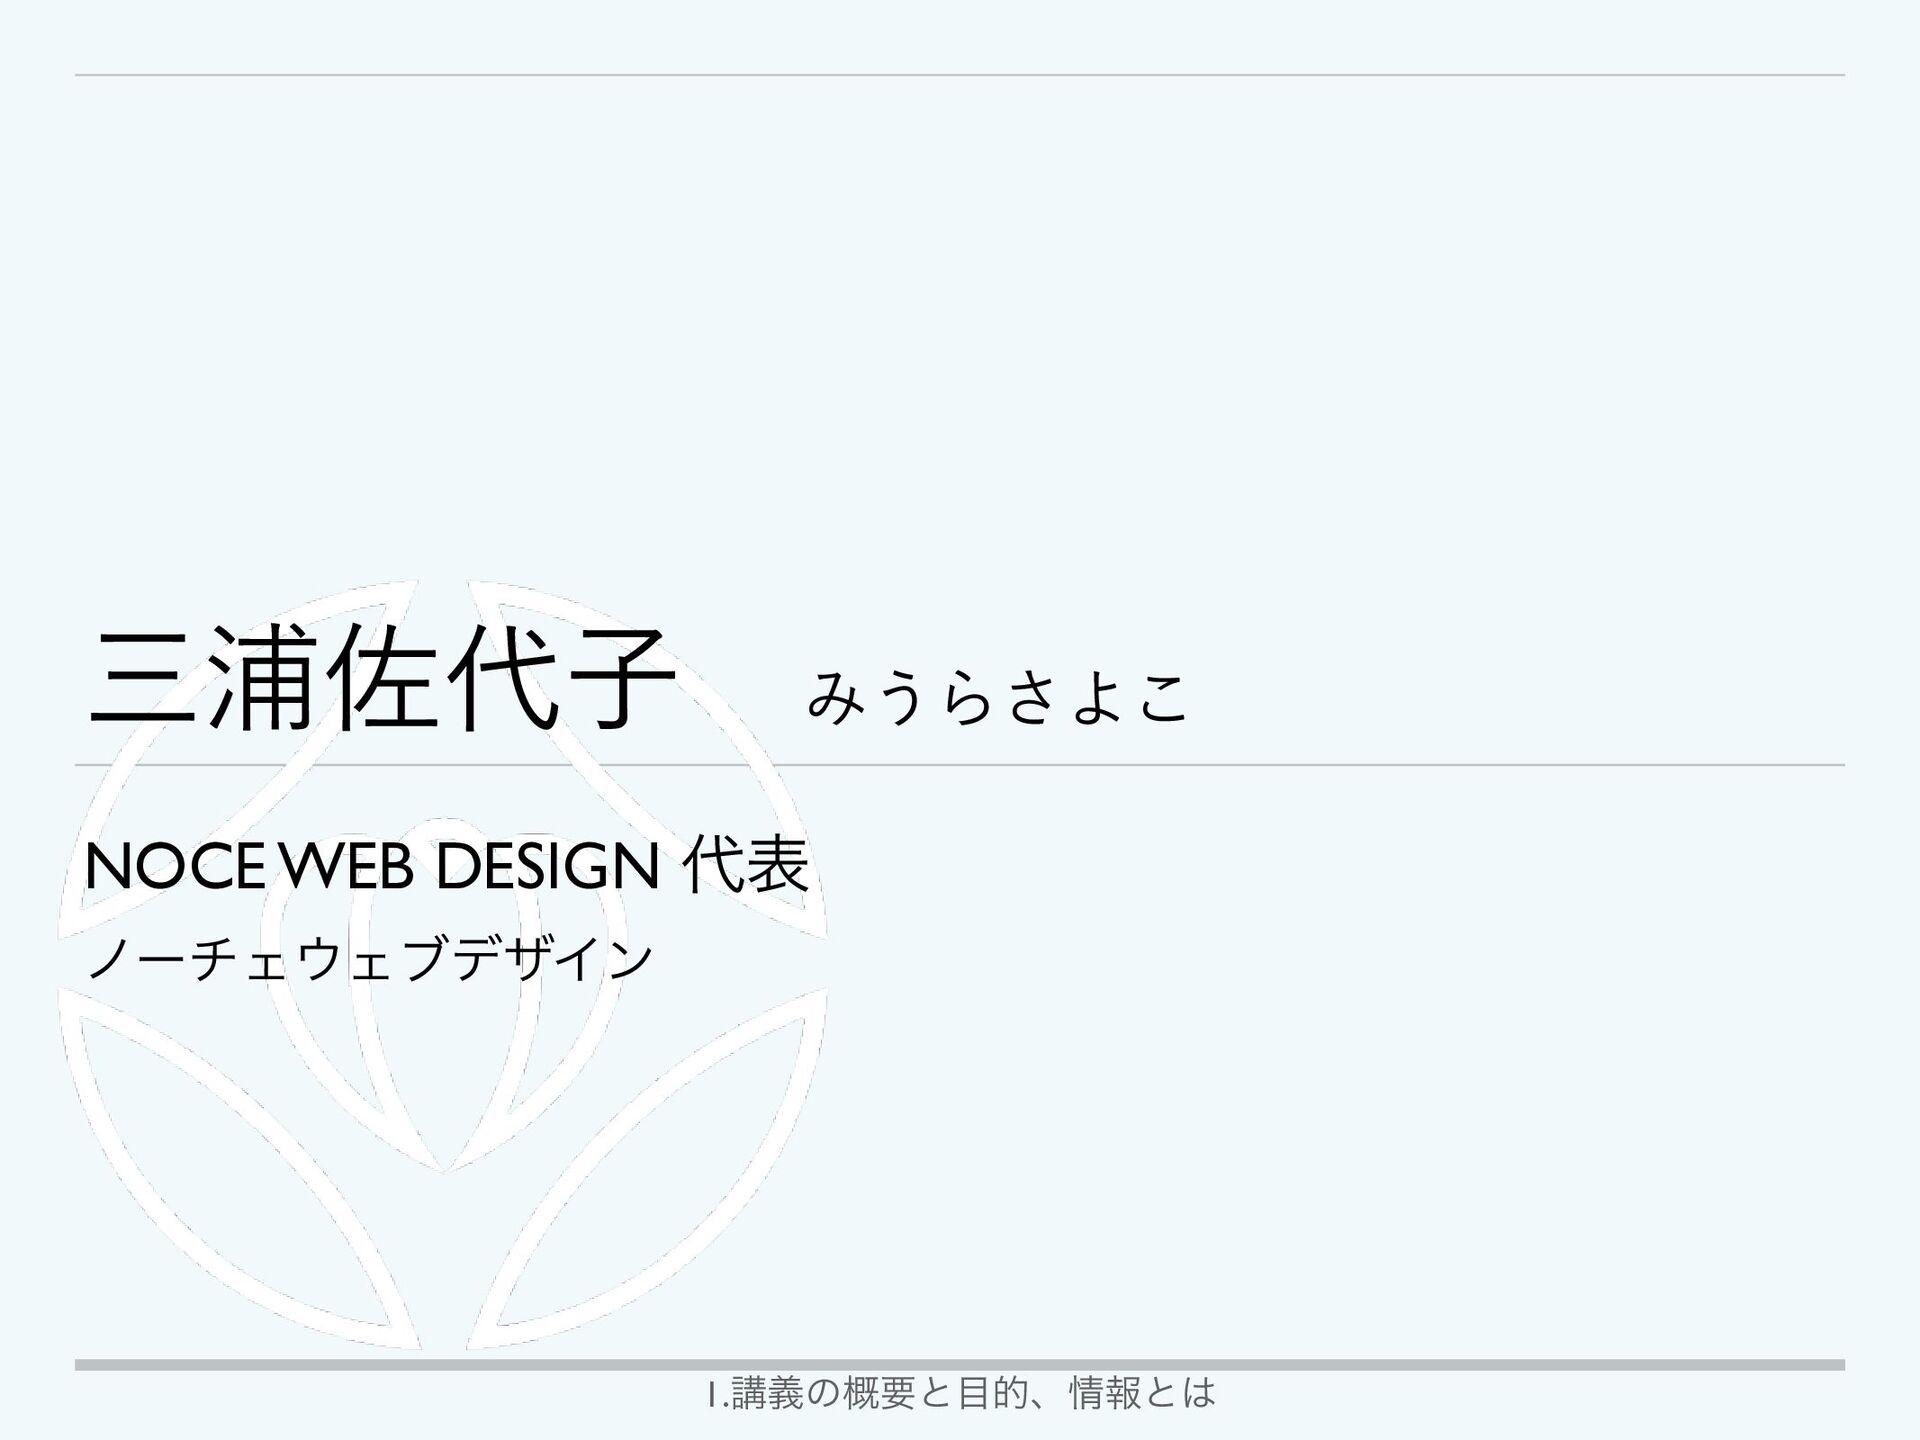 ӜࠤࢠɹΈ͏Β͞Α͜ NOCE WEB DESIGN ද 1.ߨٛͷ֓ཁͱతɺใͱ...